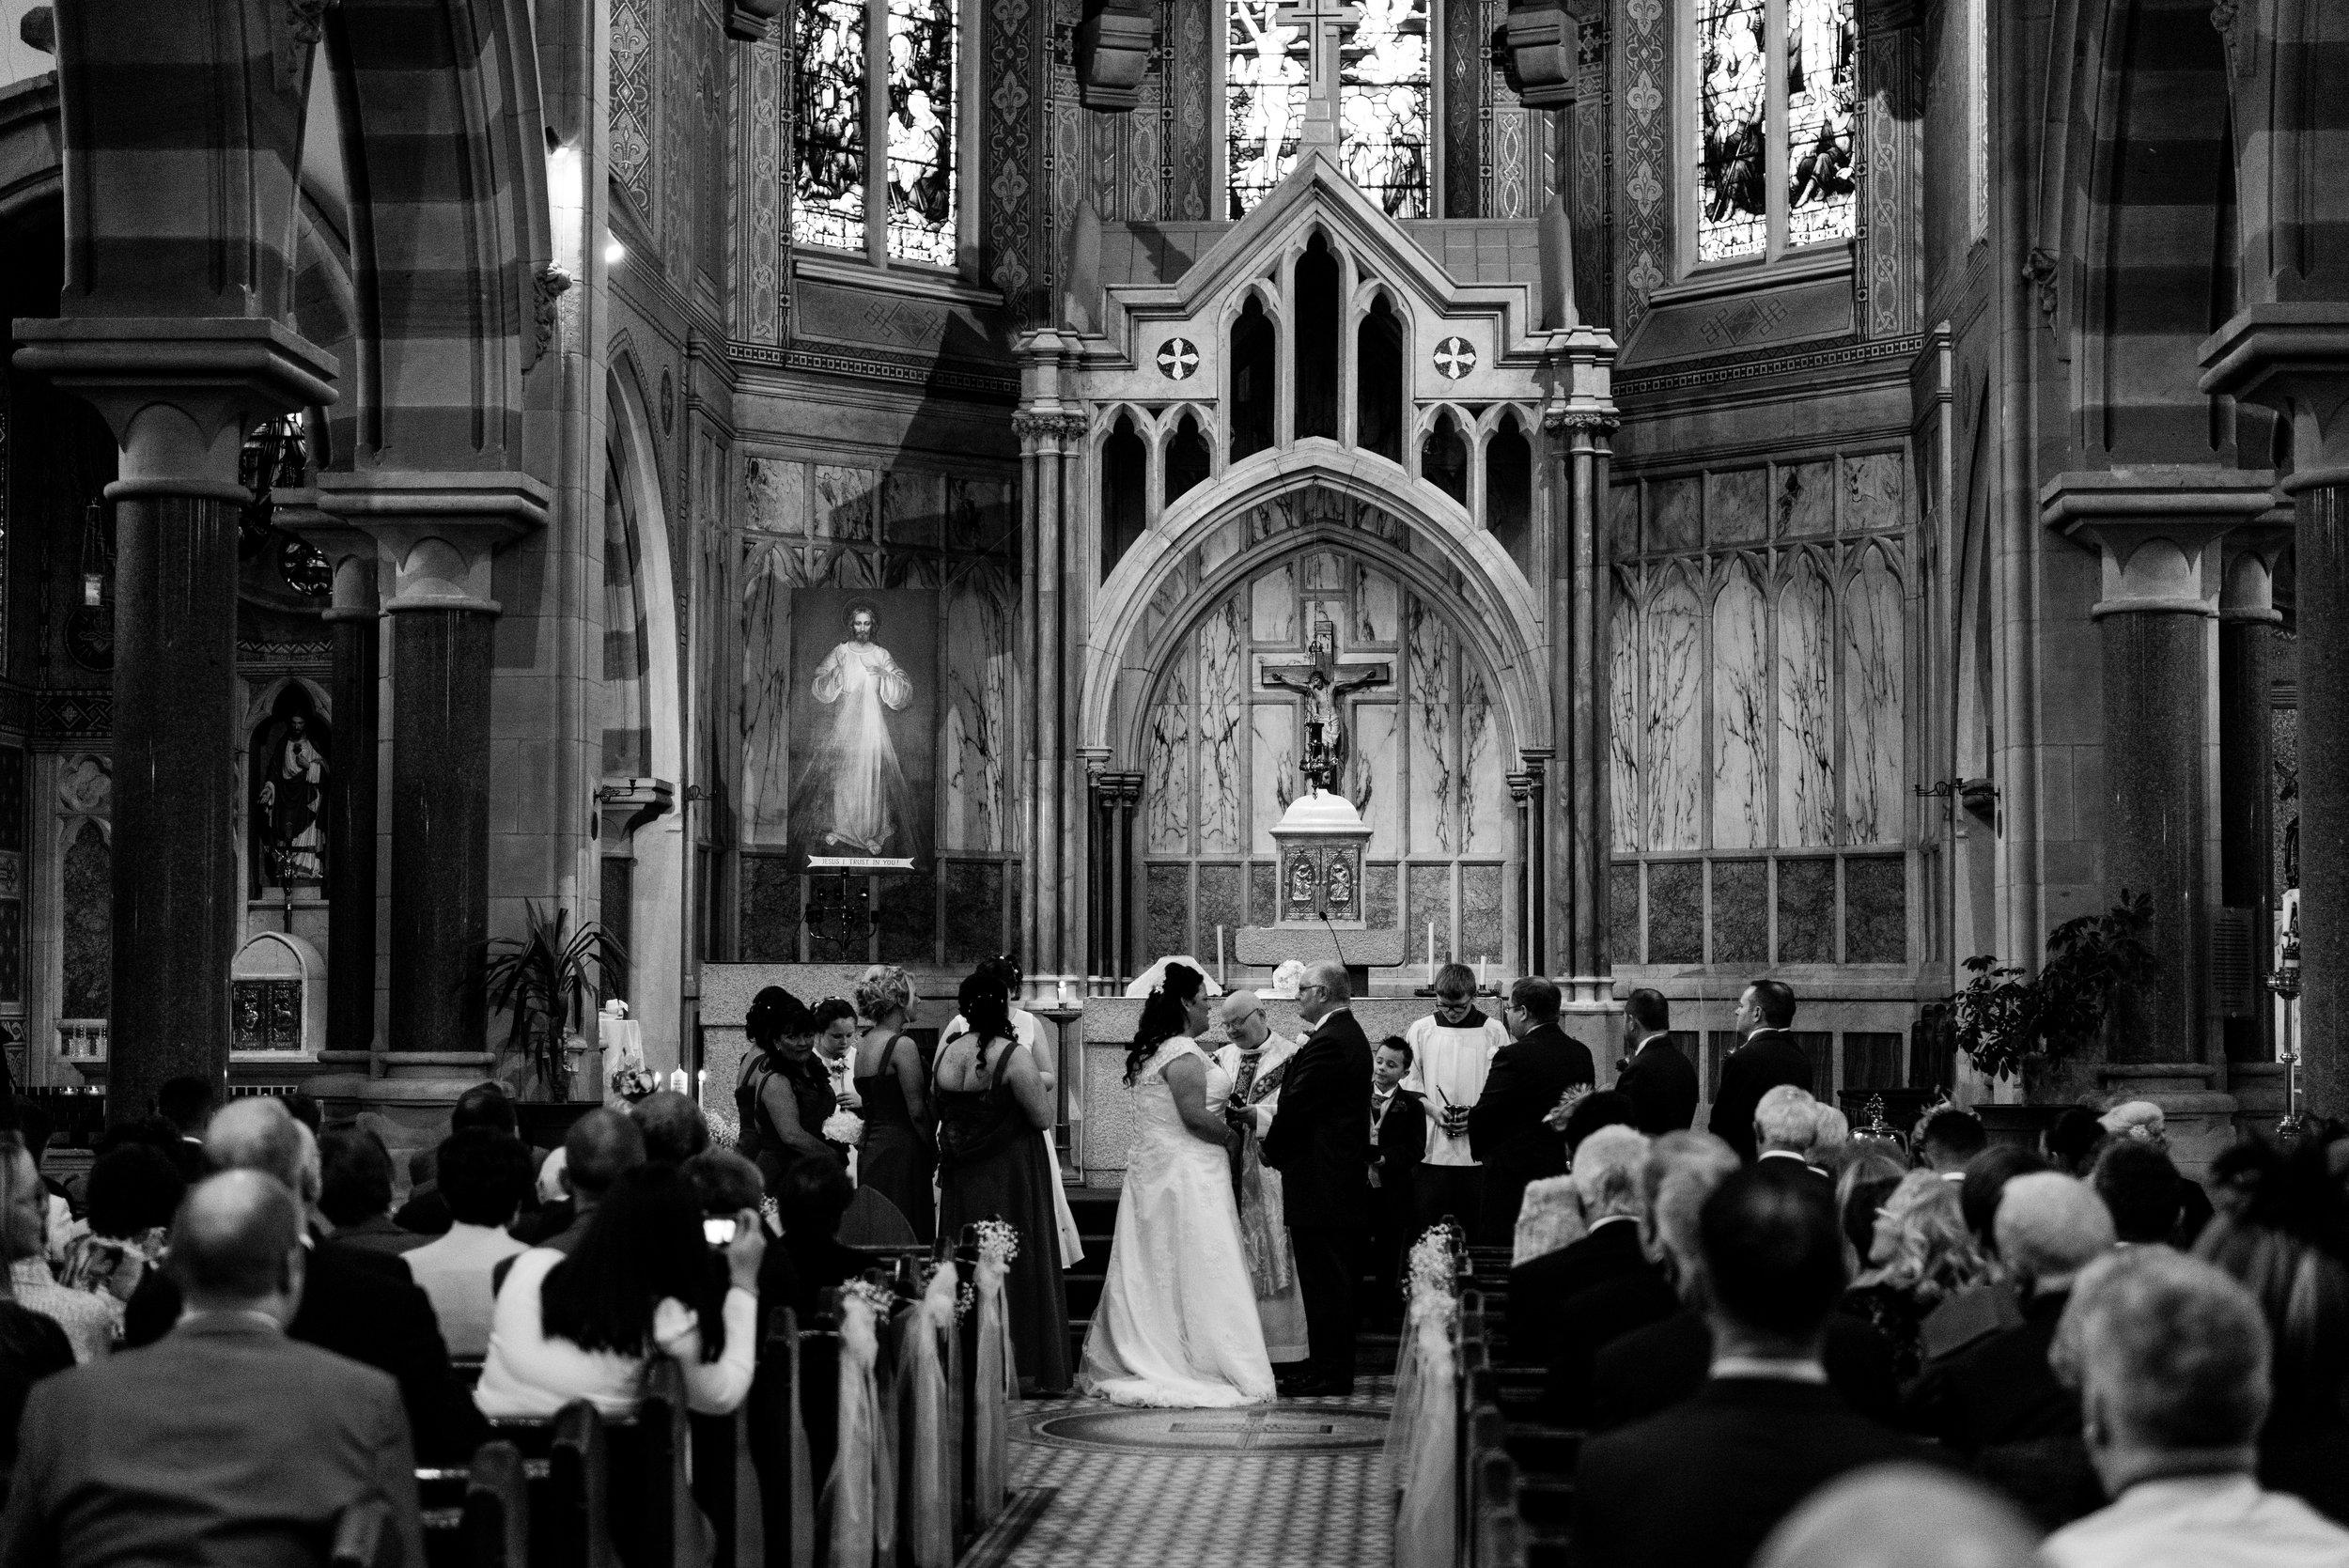 St. Pauls belfast wedding photographer pure photo n.i ceremony start